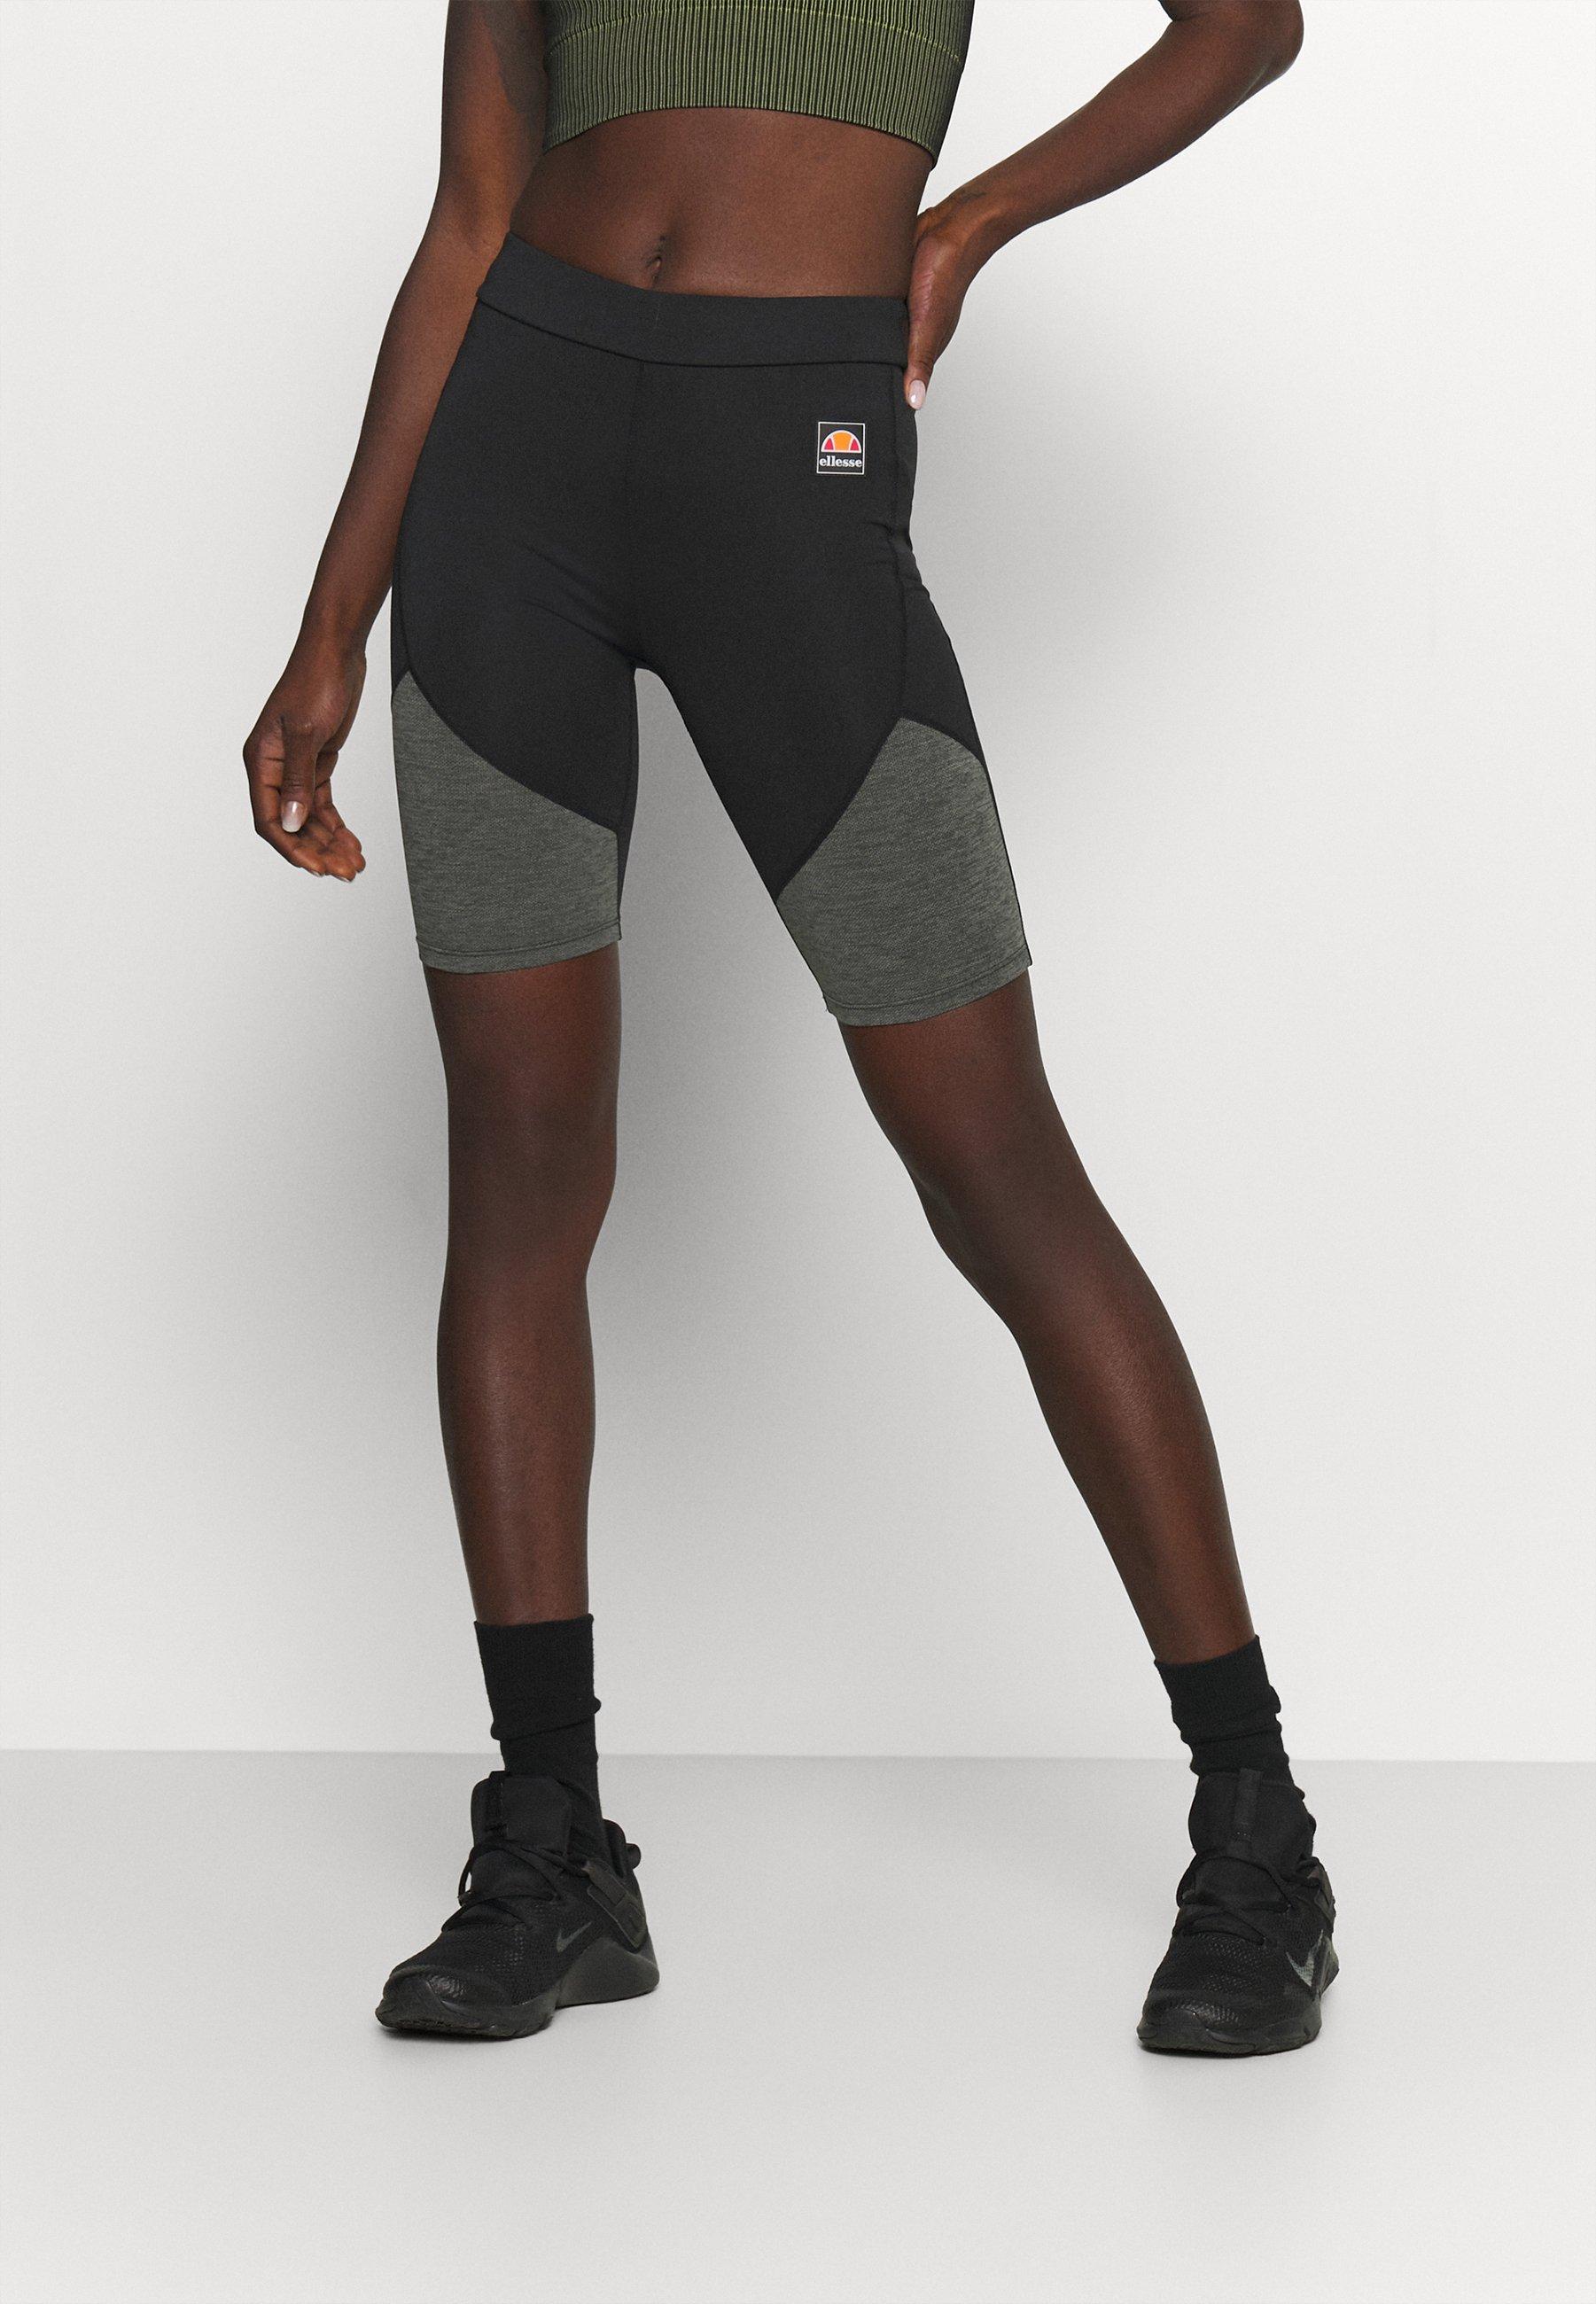 Femme VISCO - Collants